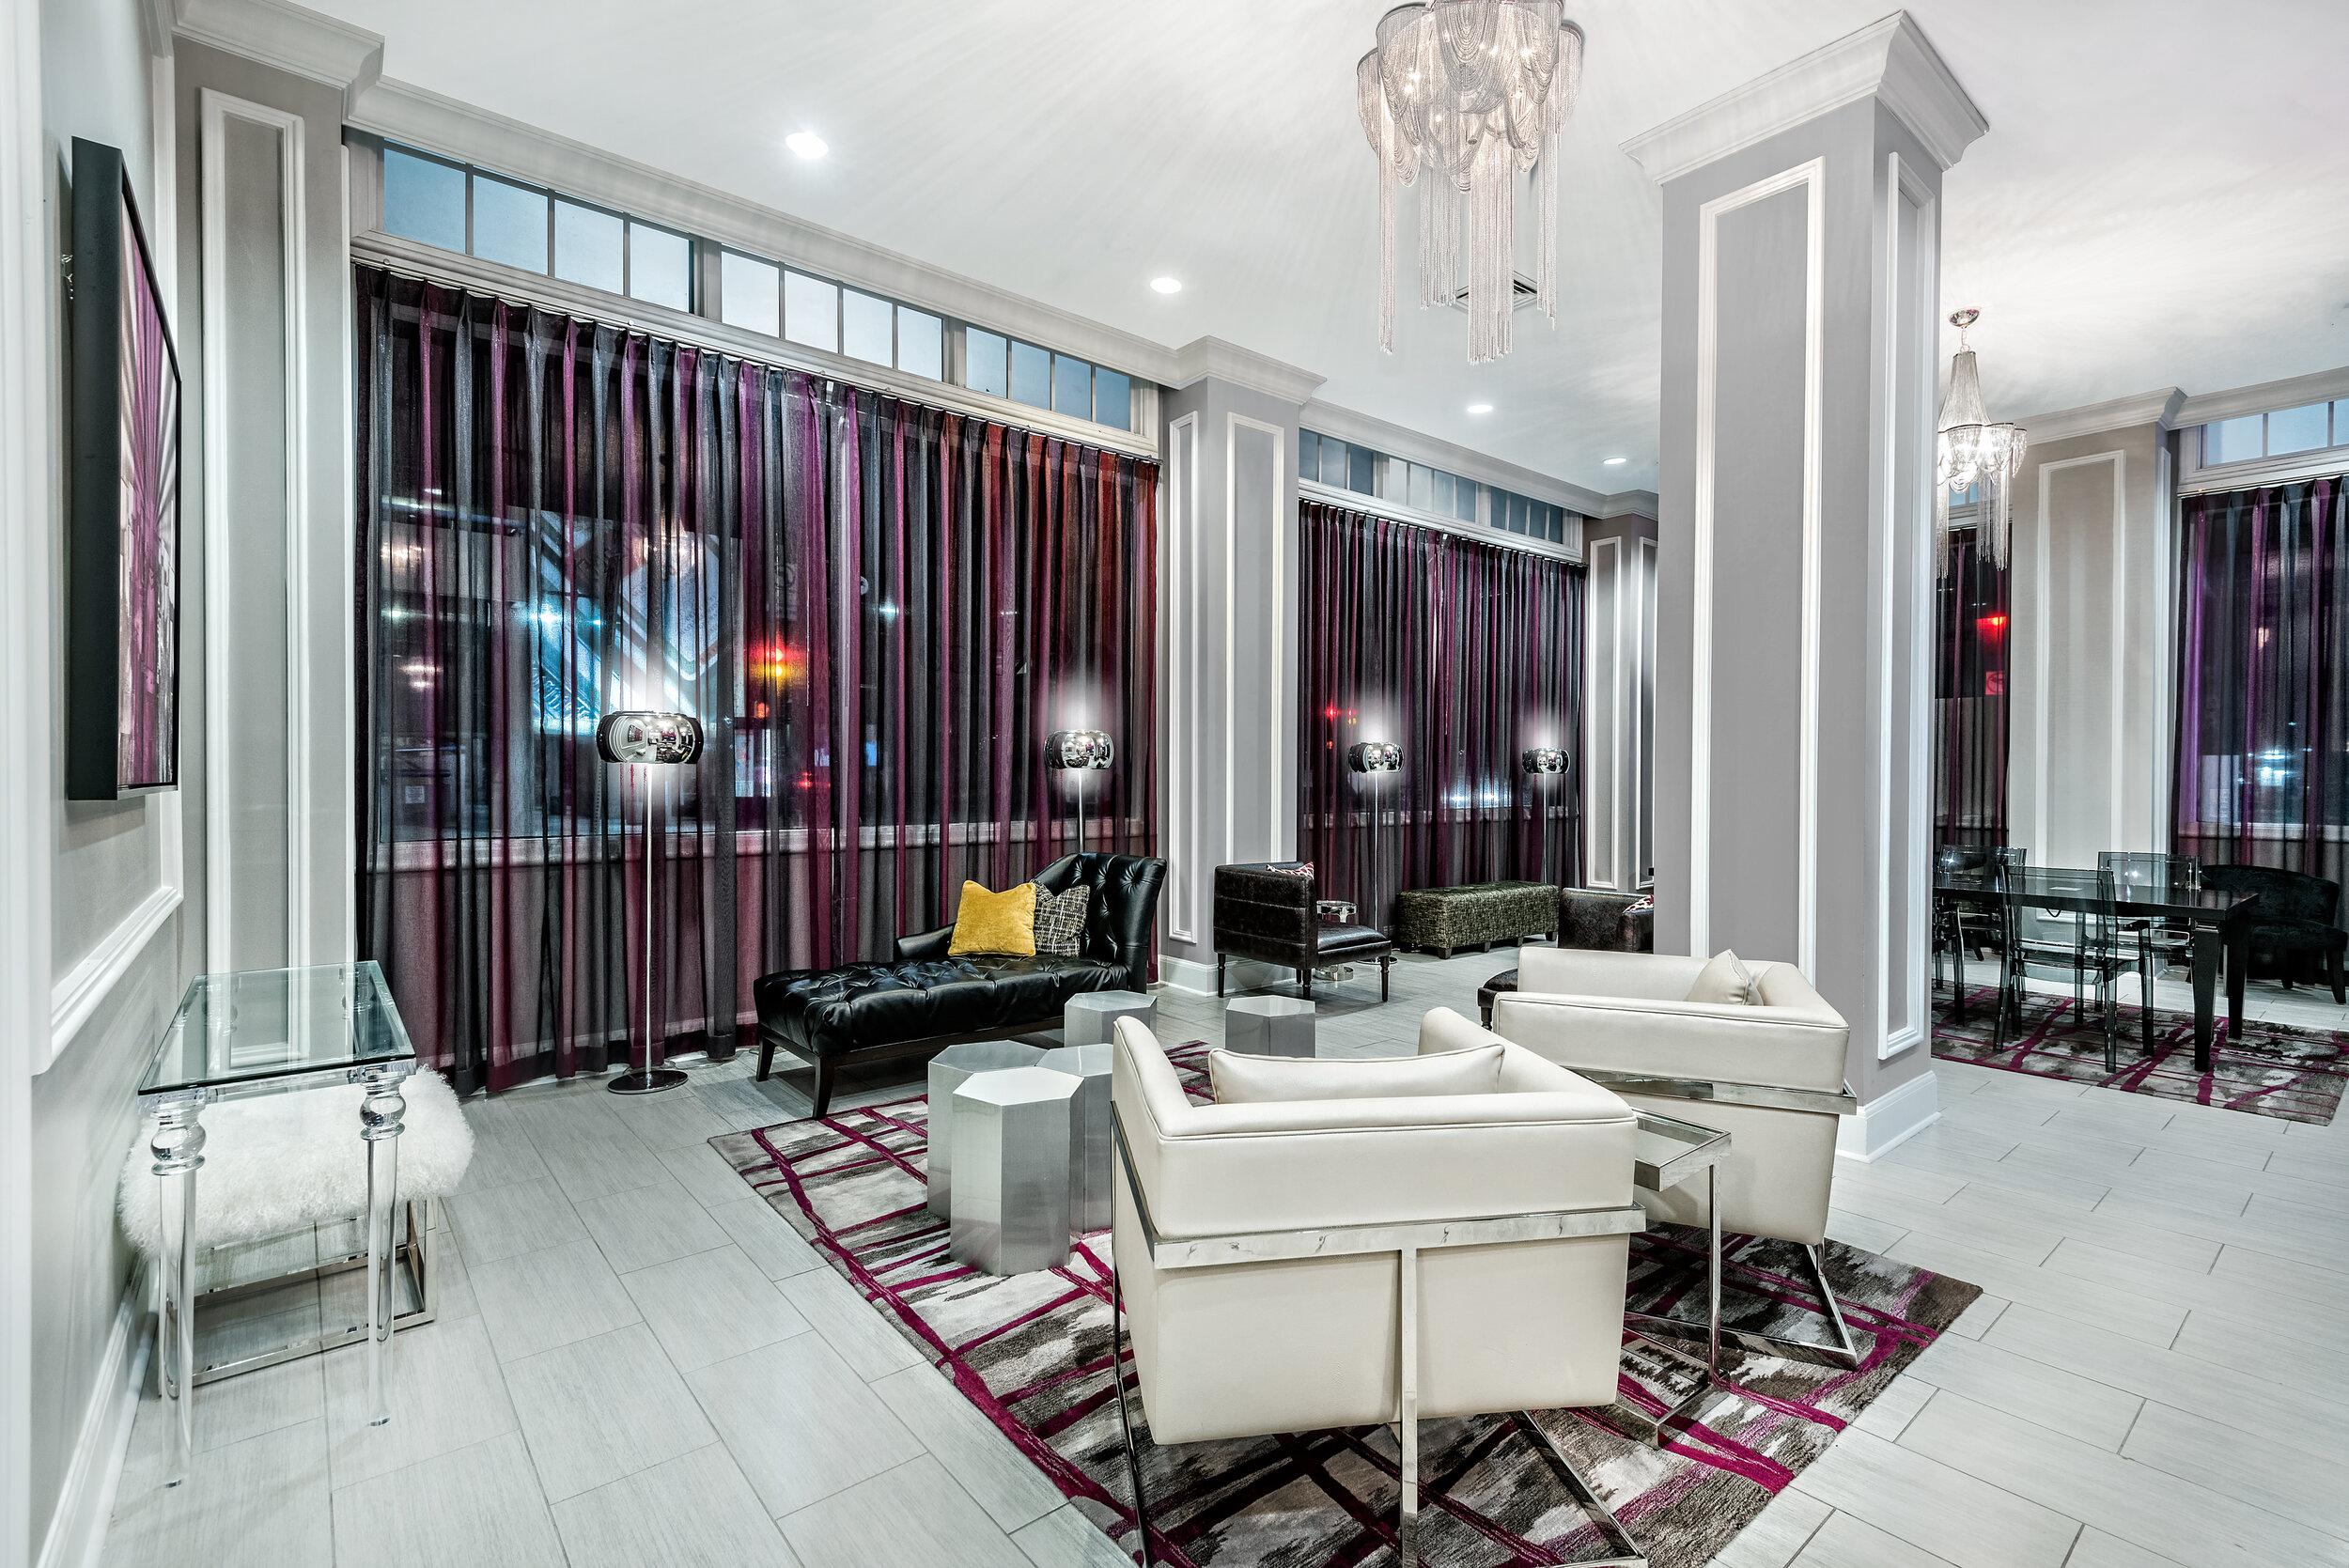 dalar-hotel-indigo-dallas-downtown-lobby-seating2.jpg